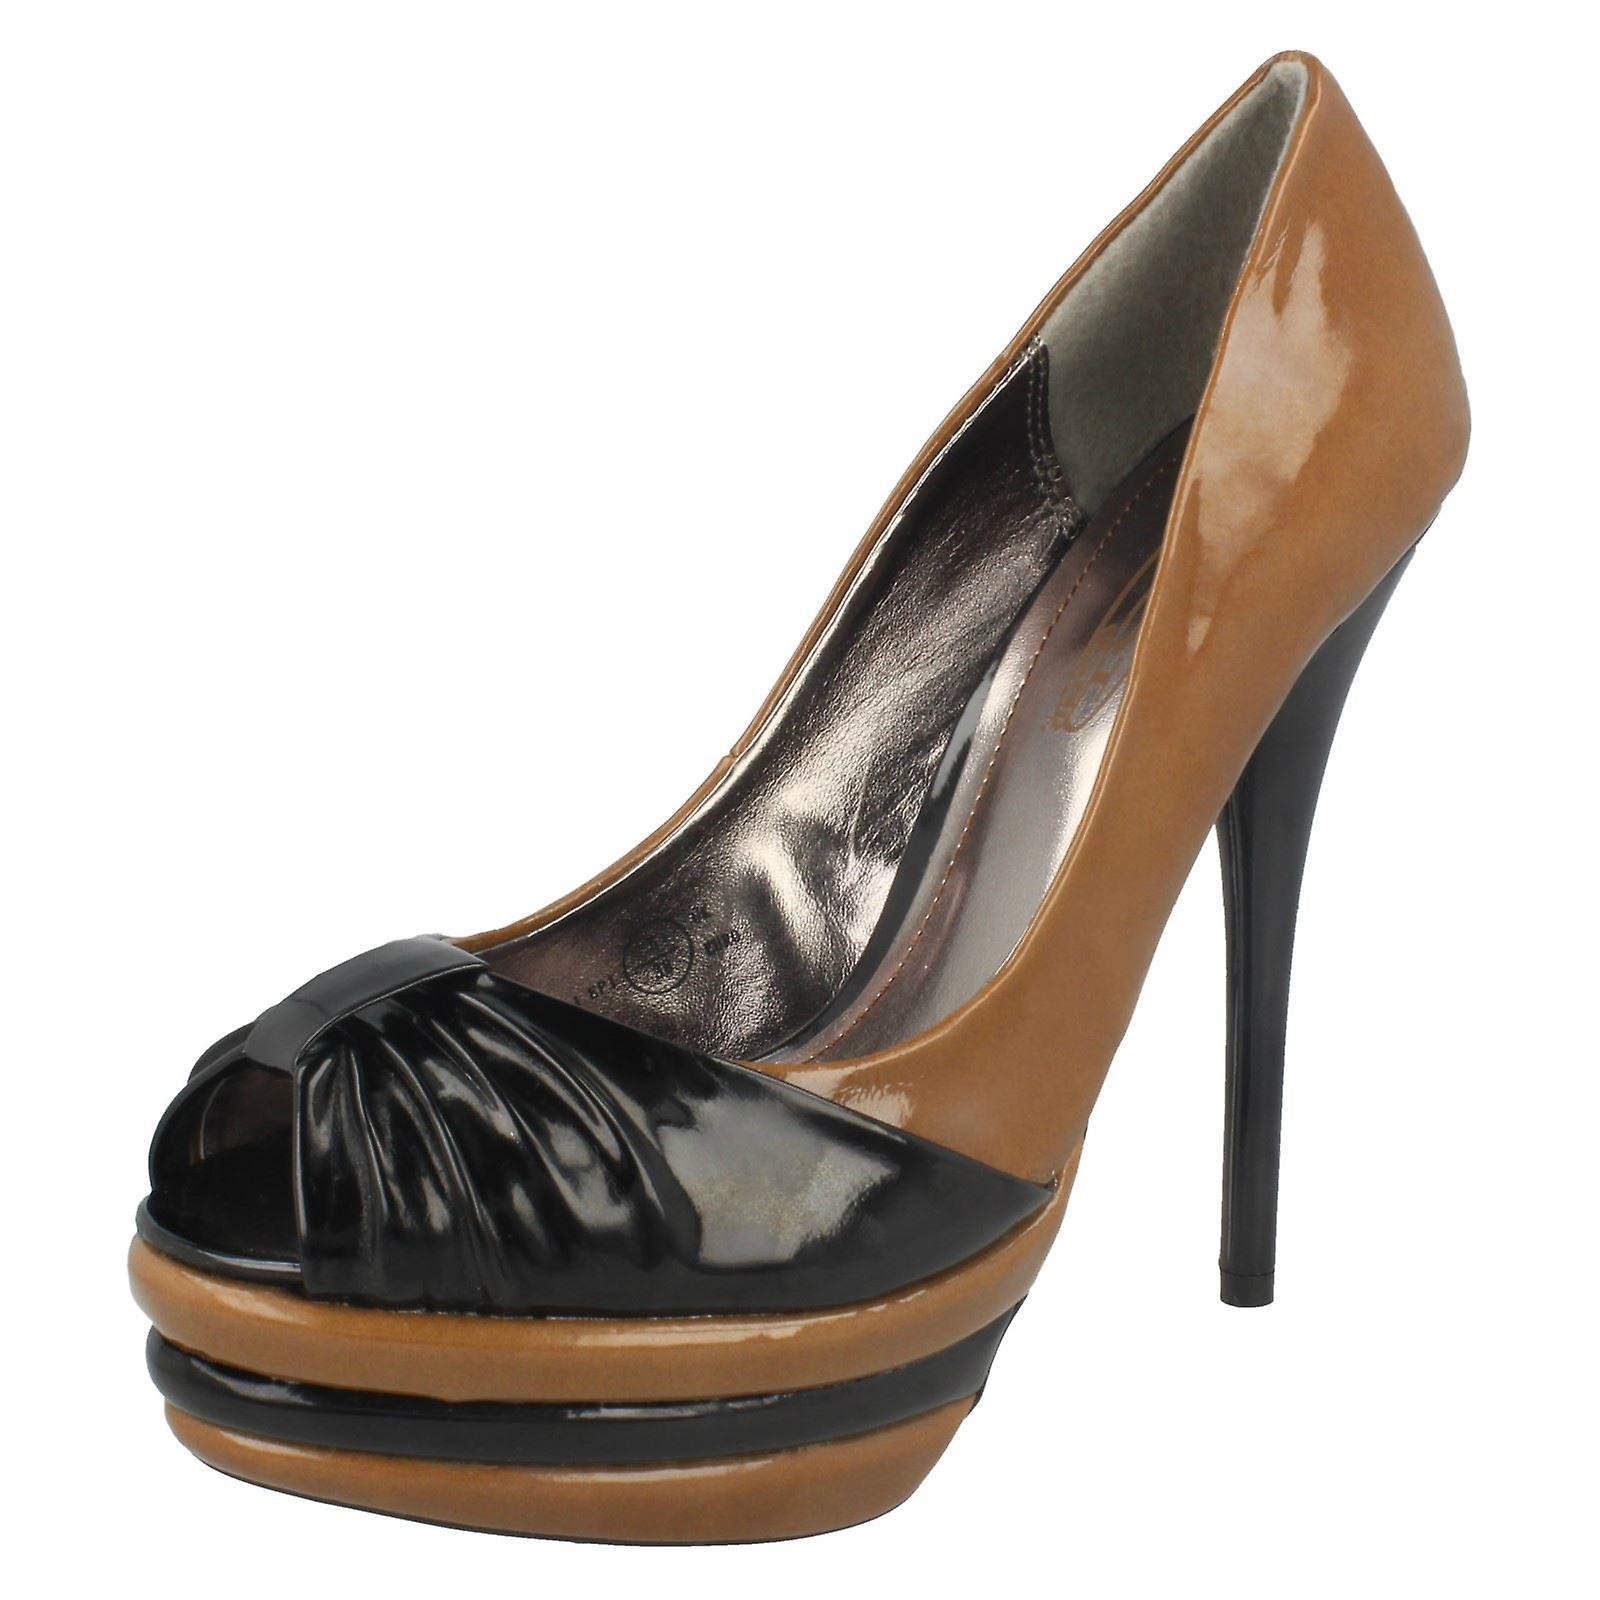 Heels Spot High Platform Toe Peep On Ladies nYWRqzn